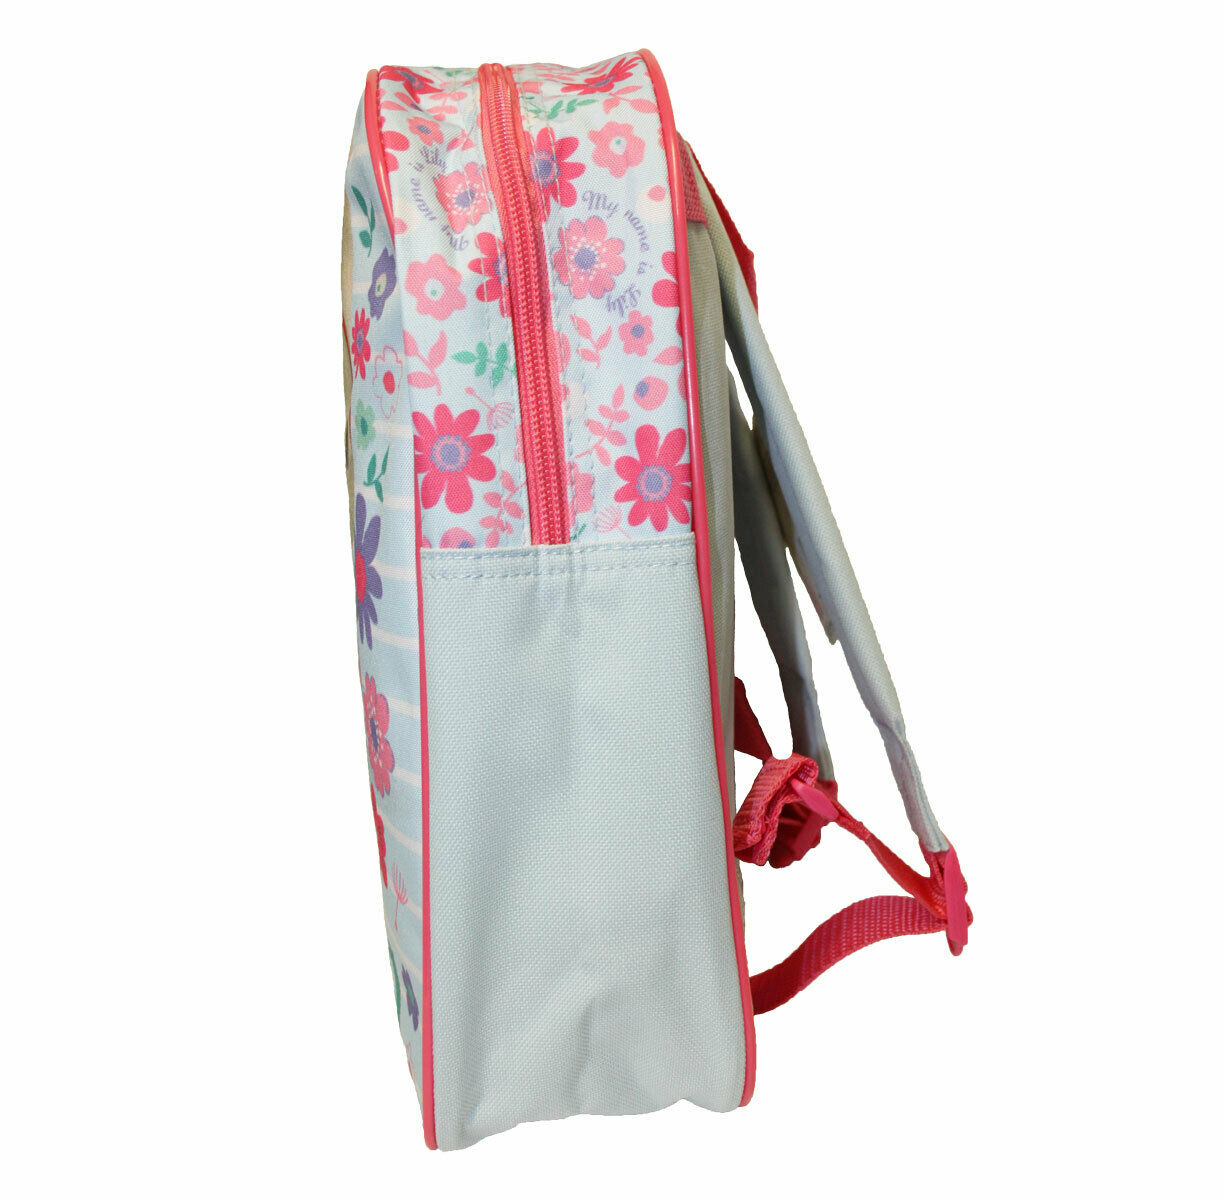 Disney Peter Rabbit Children' S Blue/pink School Bag Rucksack Backpack